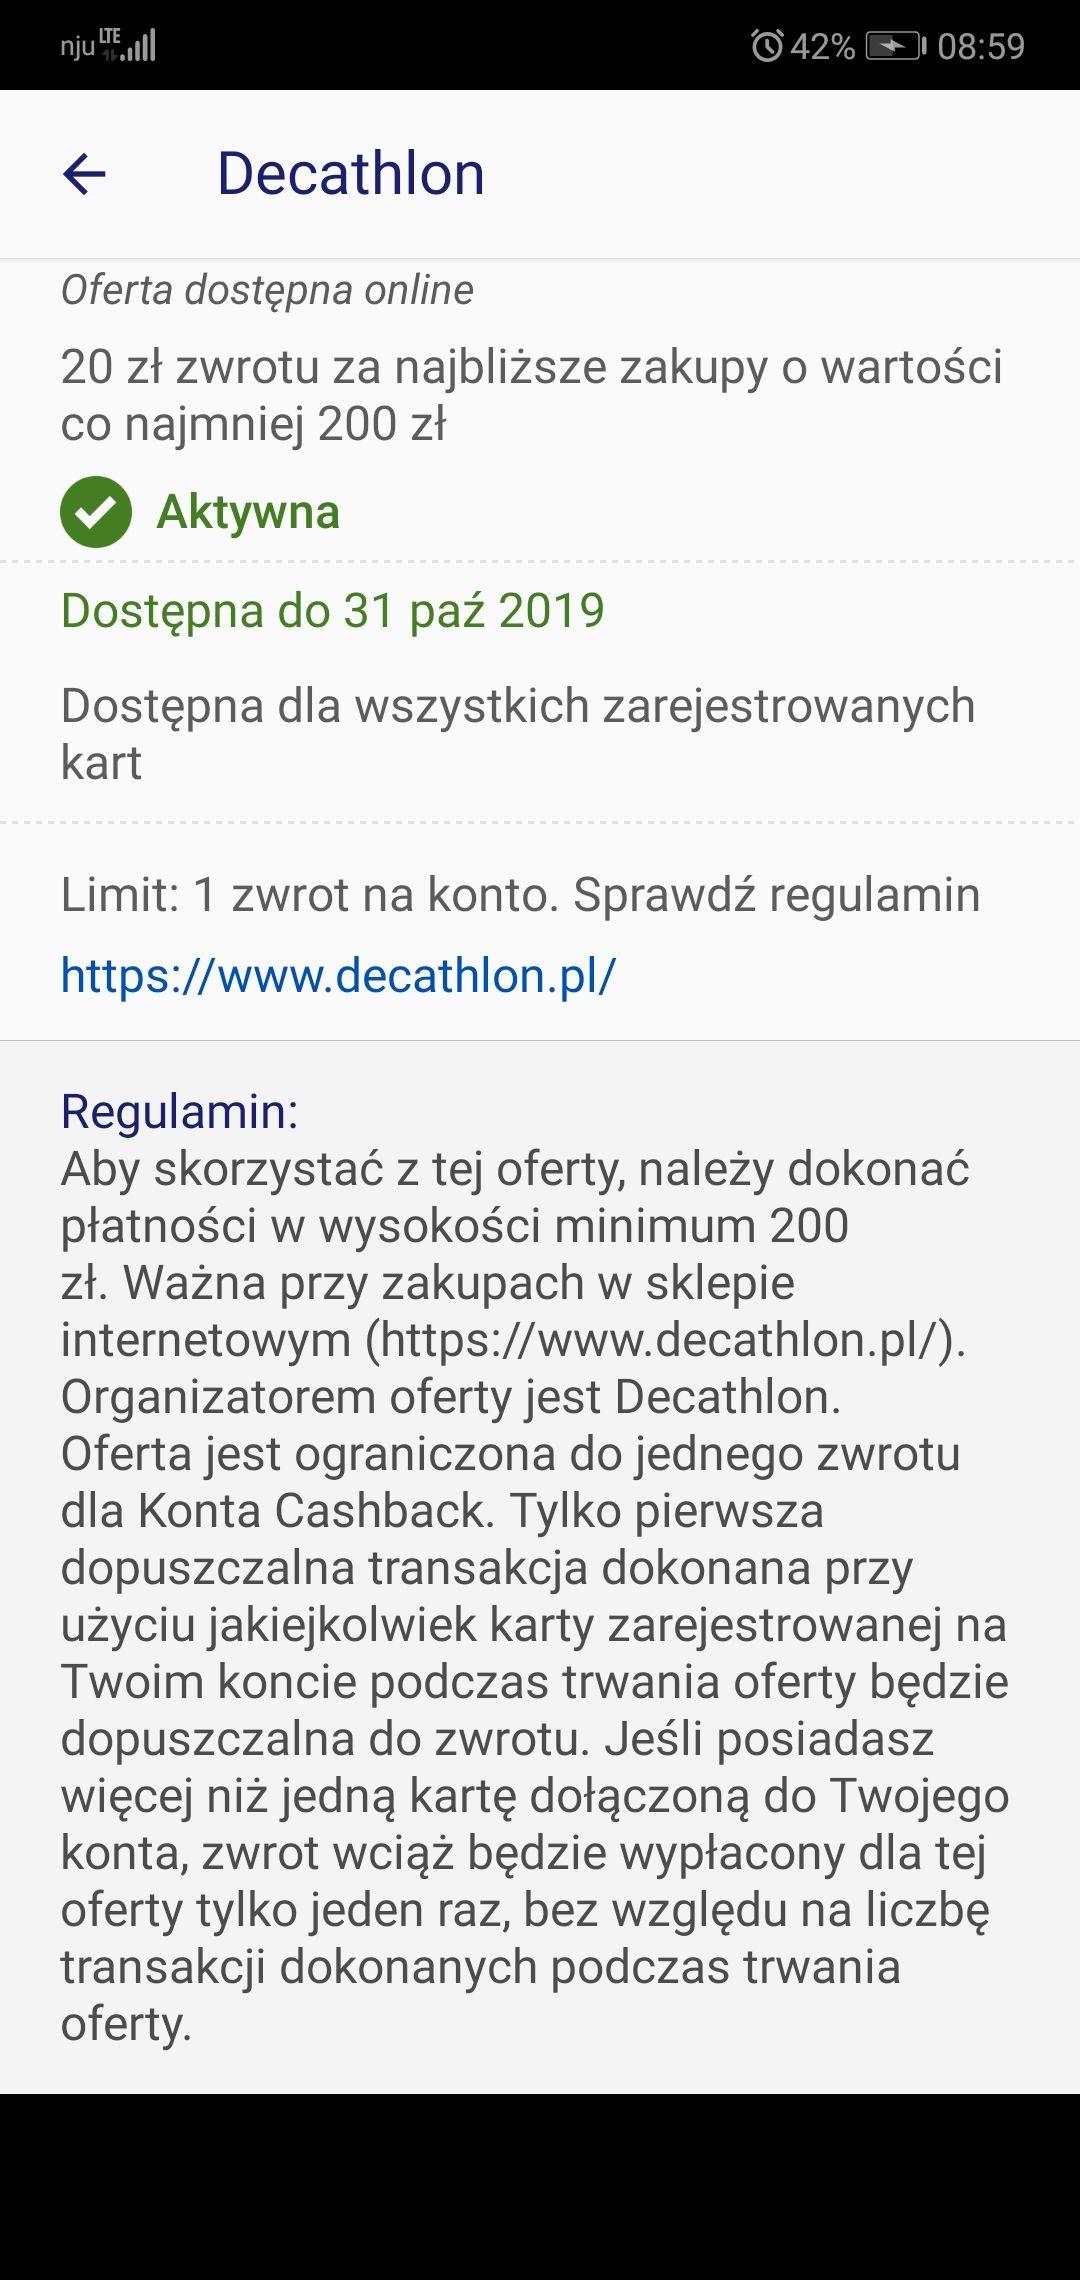 Decathlon - Zwrot 20PLN za wydane 200PLN, online - visa oferty